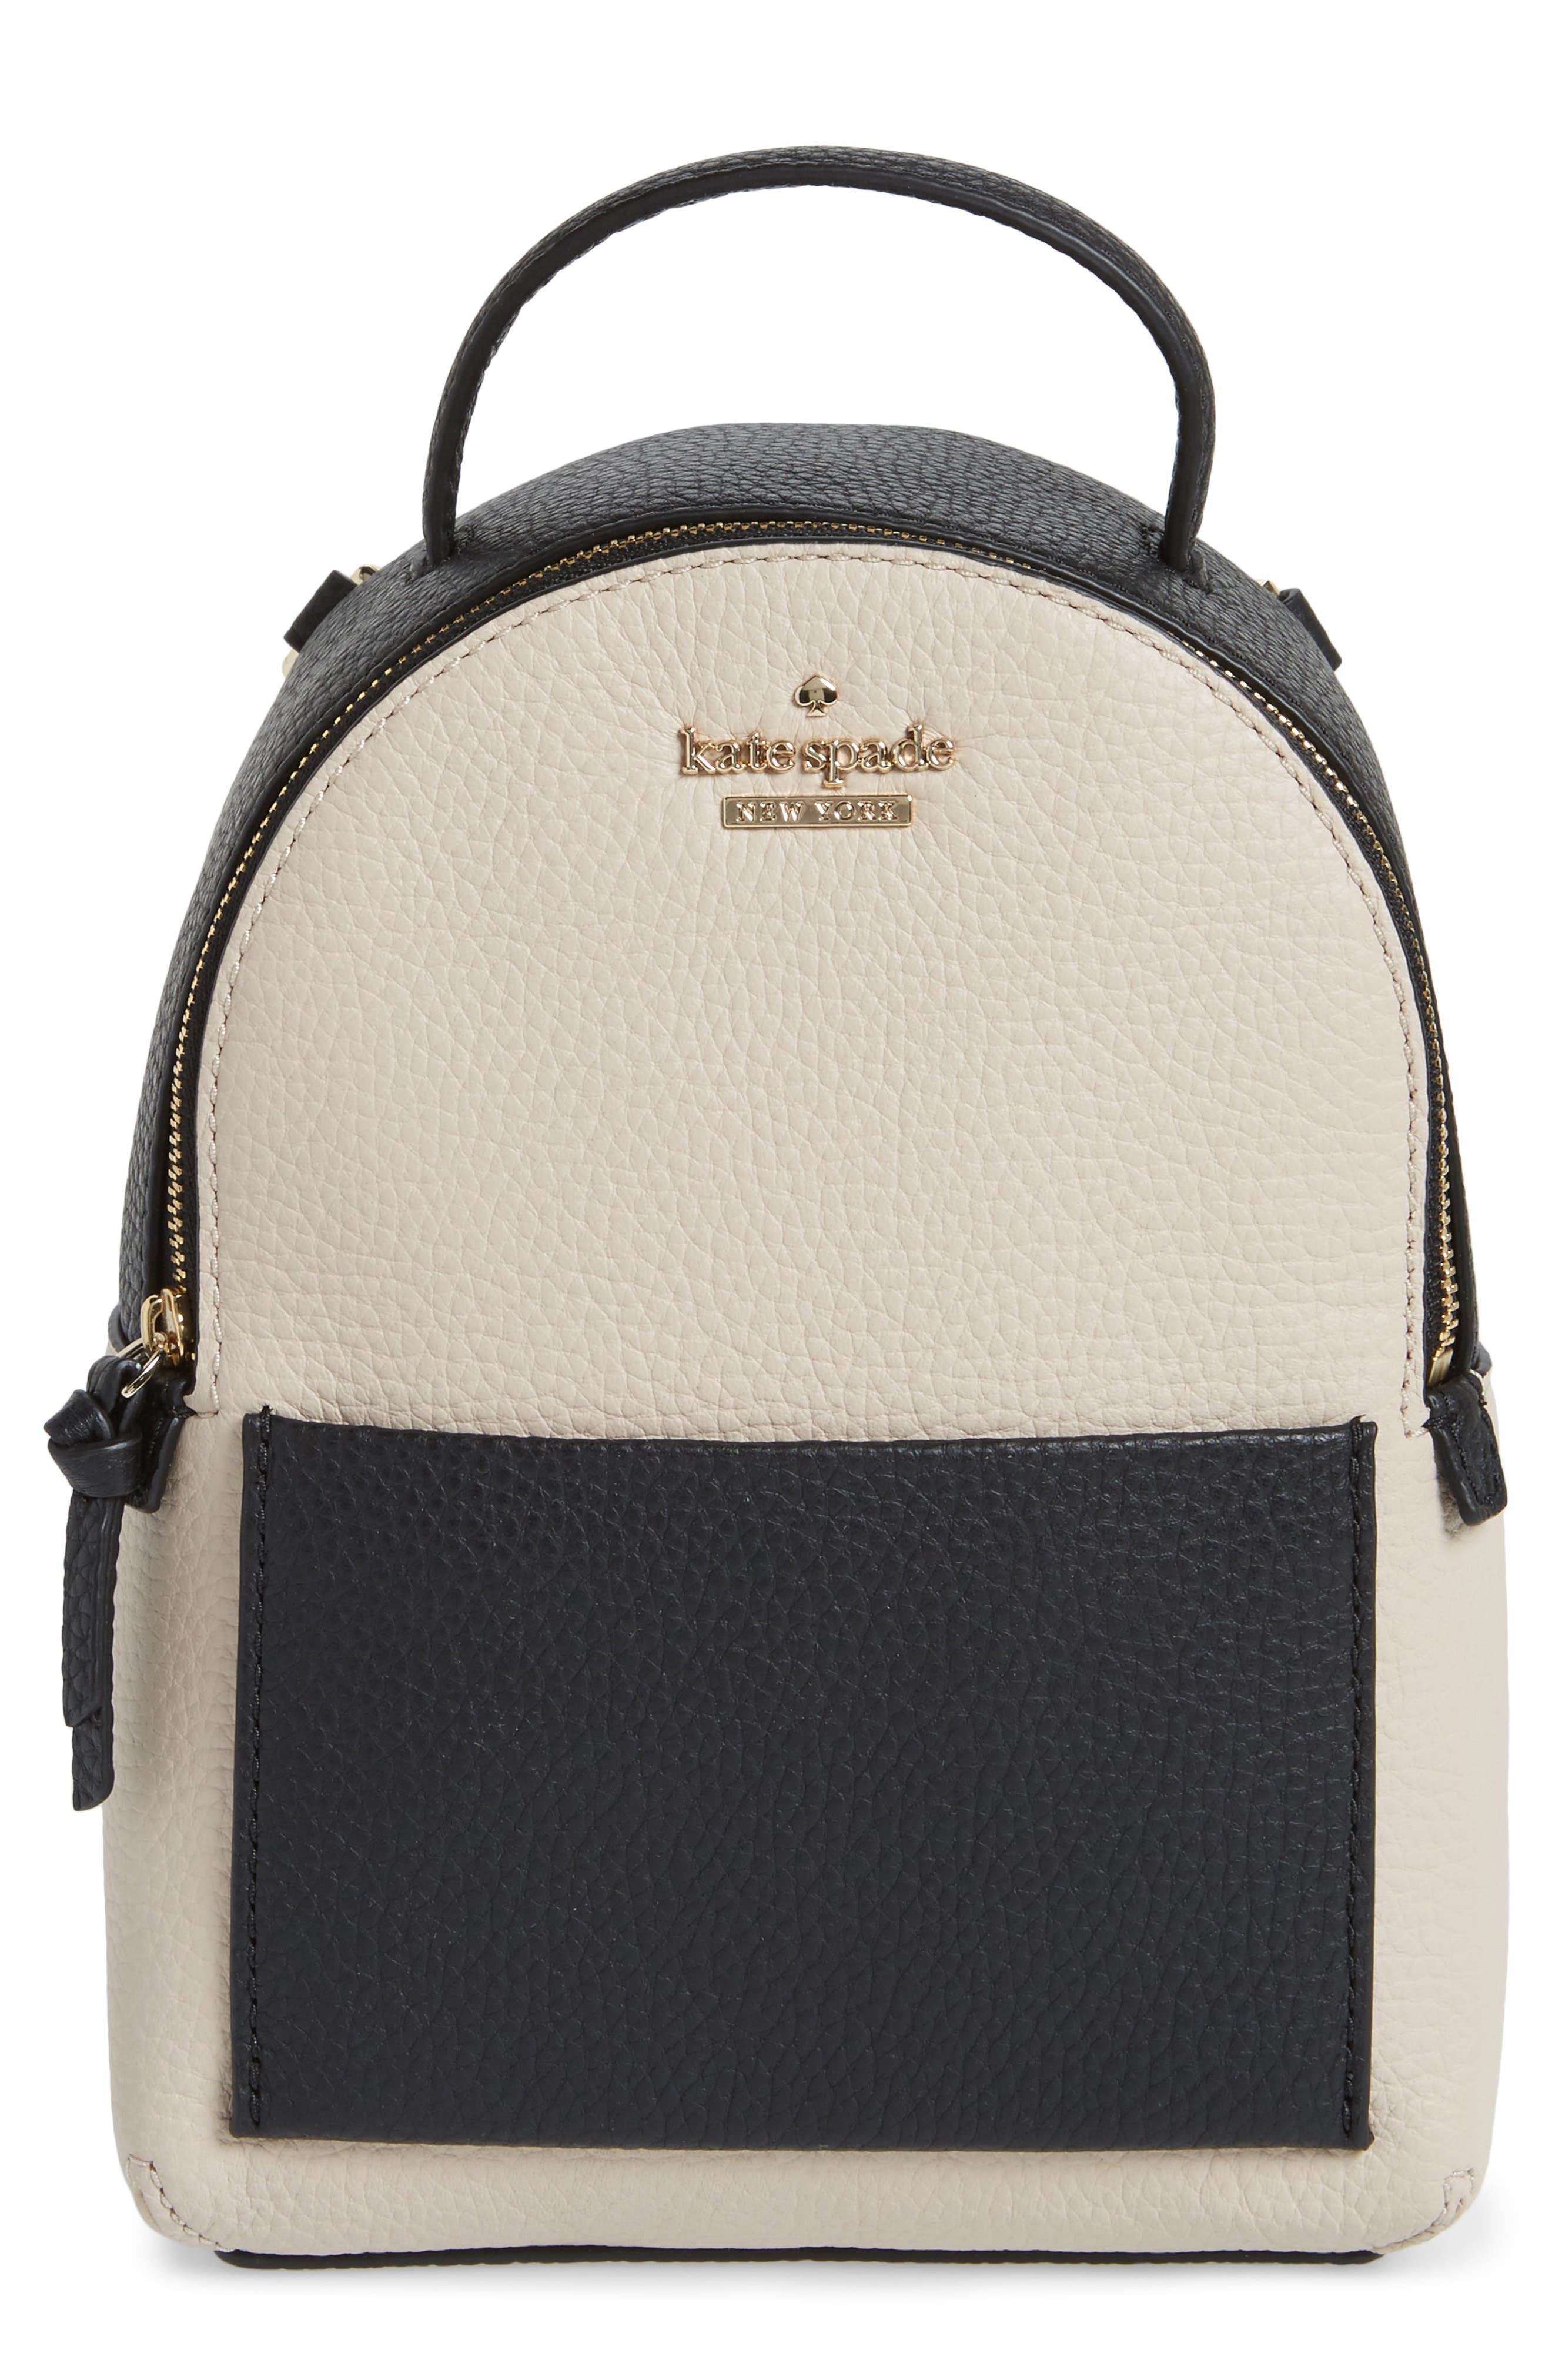 jackson street merry convertible leather backpack,                             Main thumbnail 1, color,                             Black/ Soft Porcelain